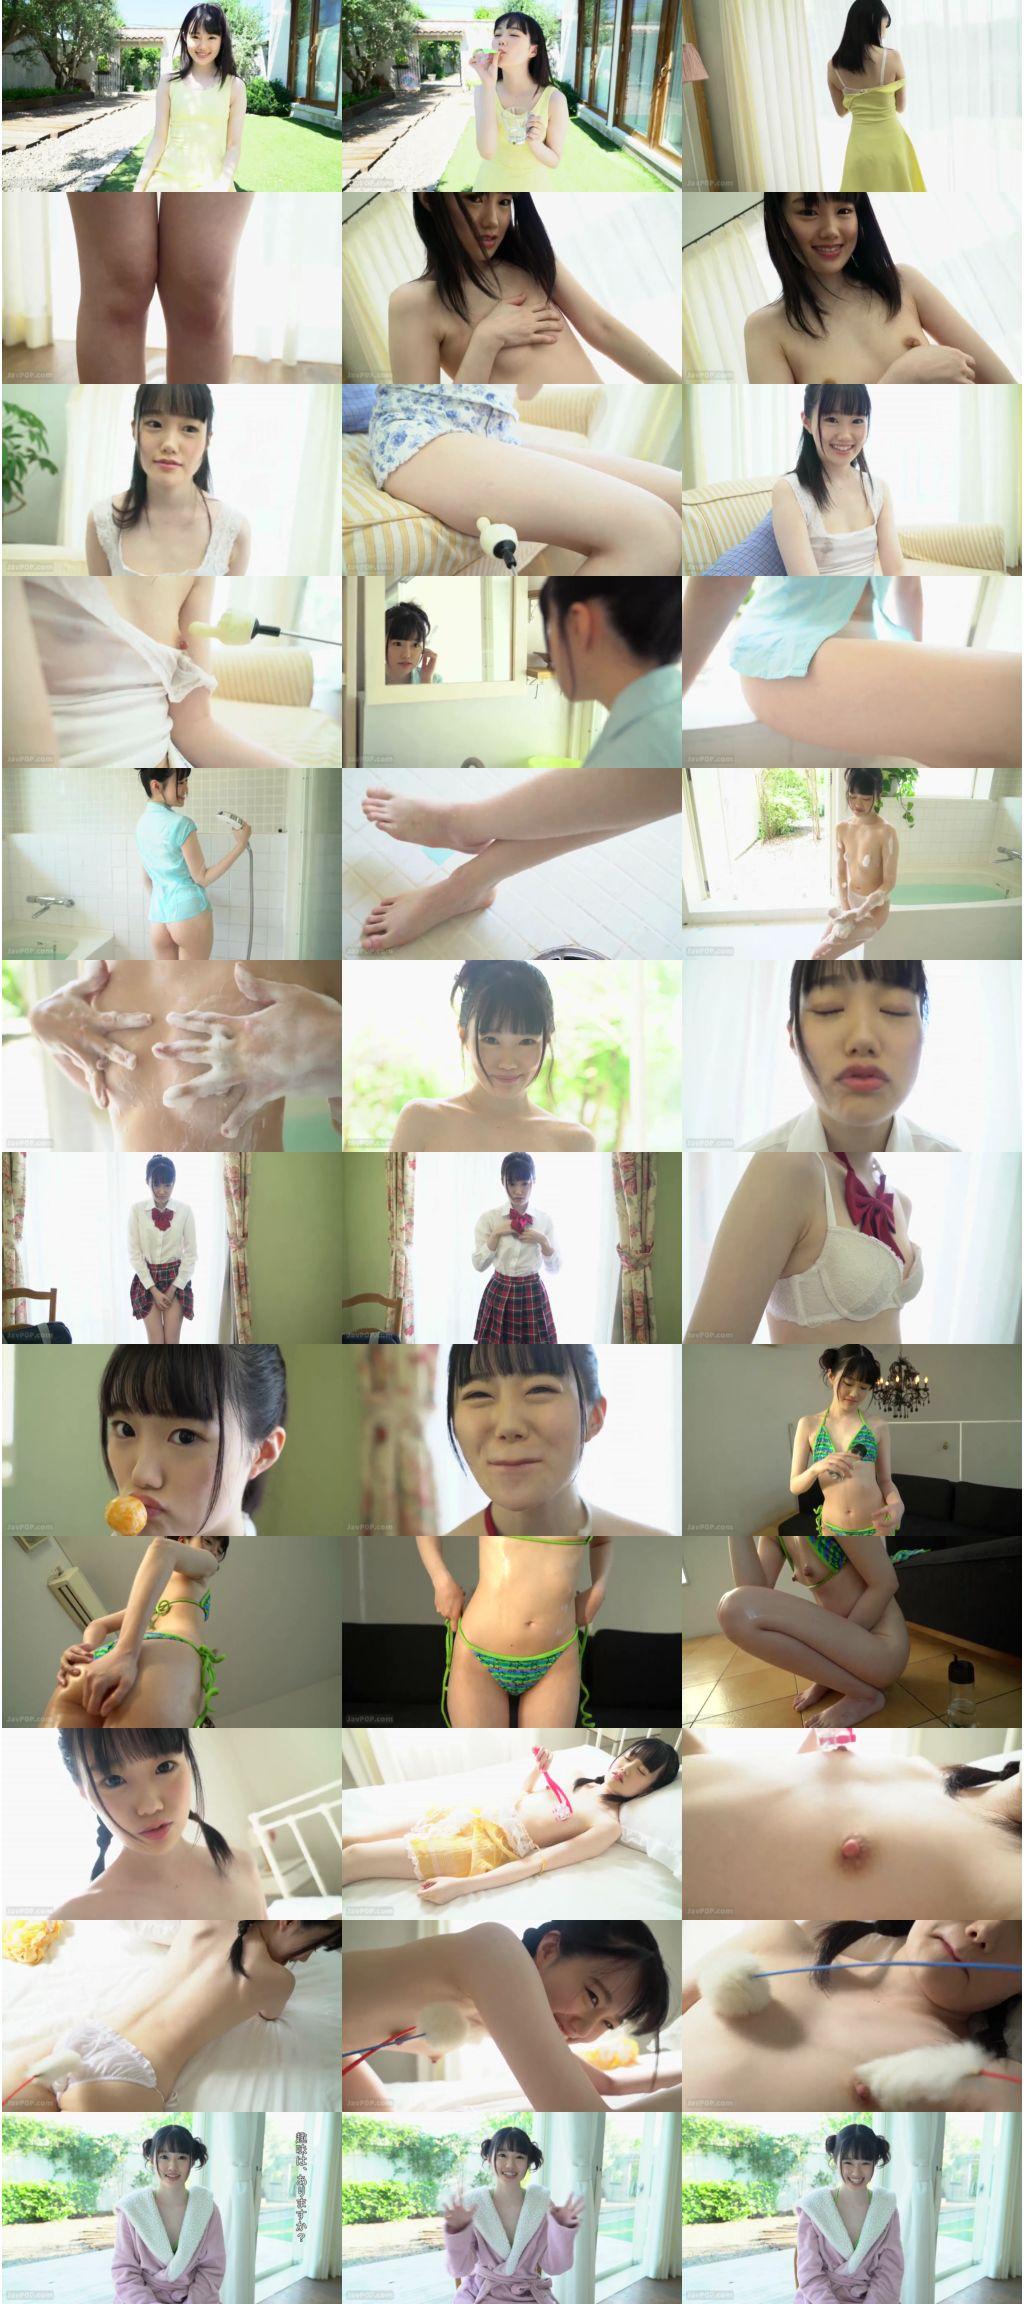 rebd 491 s - [REBD-491] Risa しろりさの淡く甘い青春/白城リサ  Entertainer Image Video Shiraki Risa 芸能人